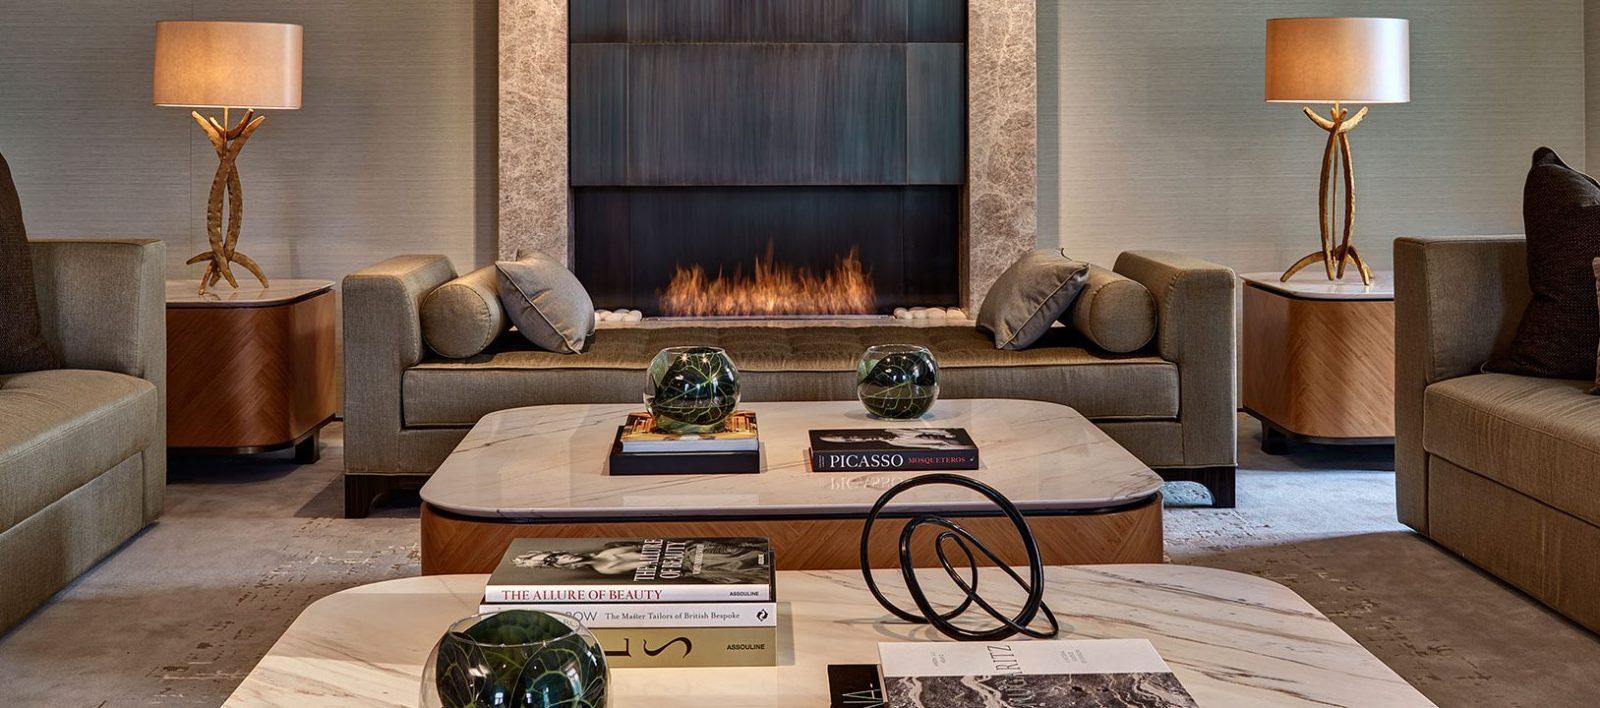 the berkeley opus suite knightsbridge fireplace